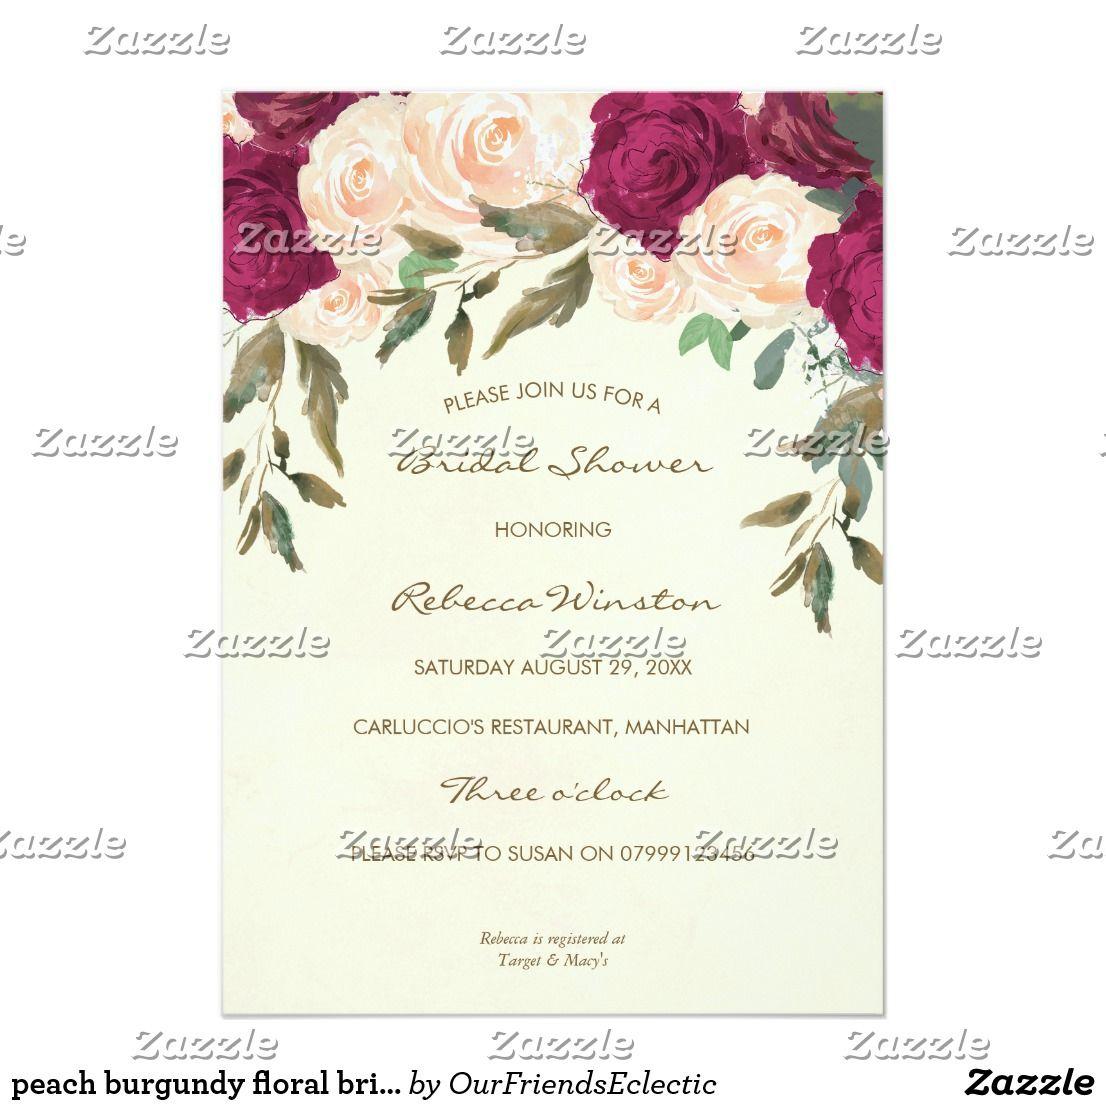 peach burgundy floral bridal shower invitation Zazzle.co